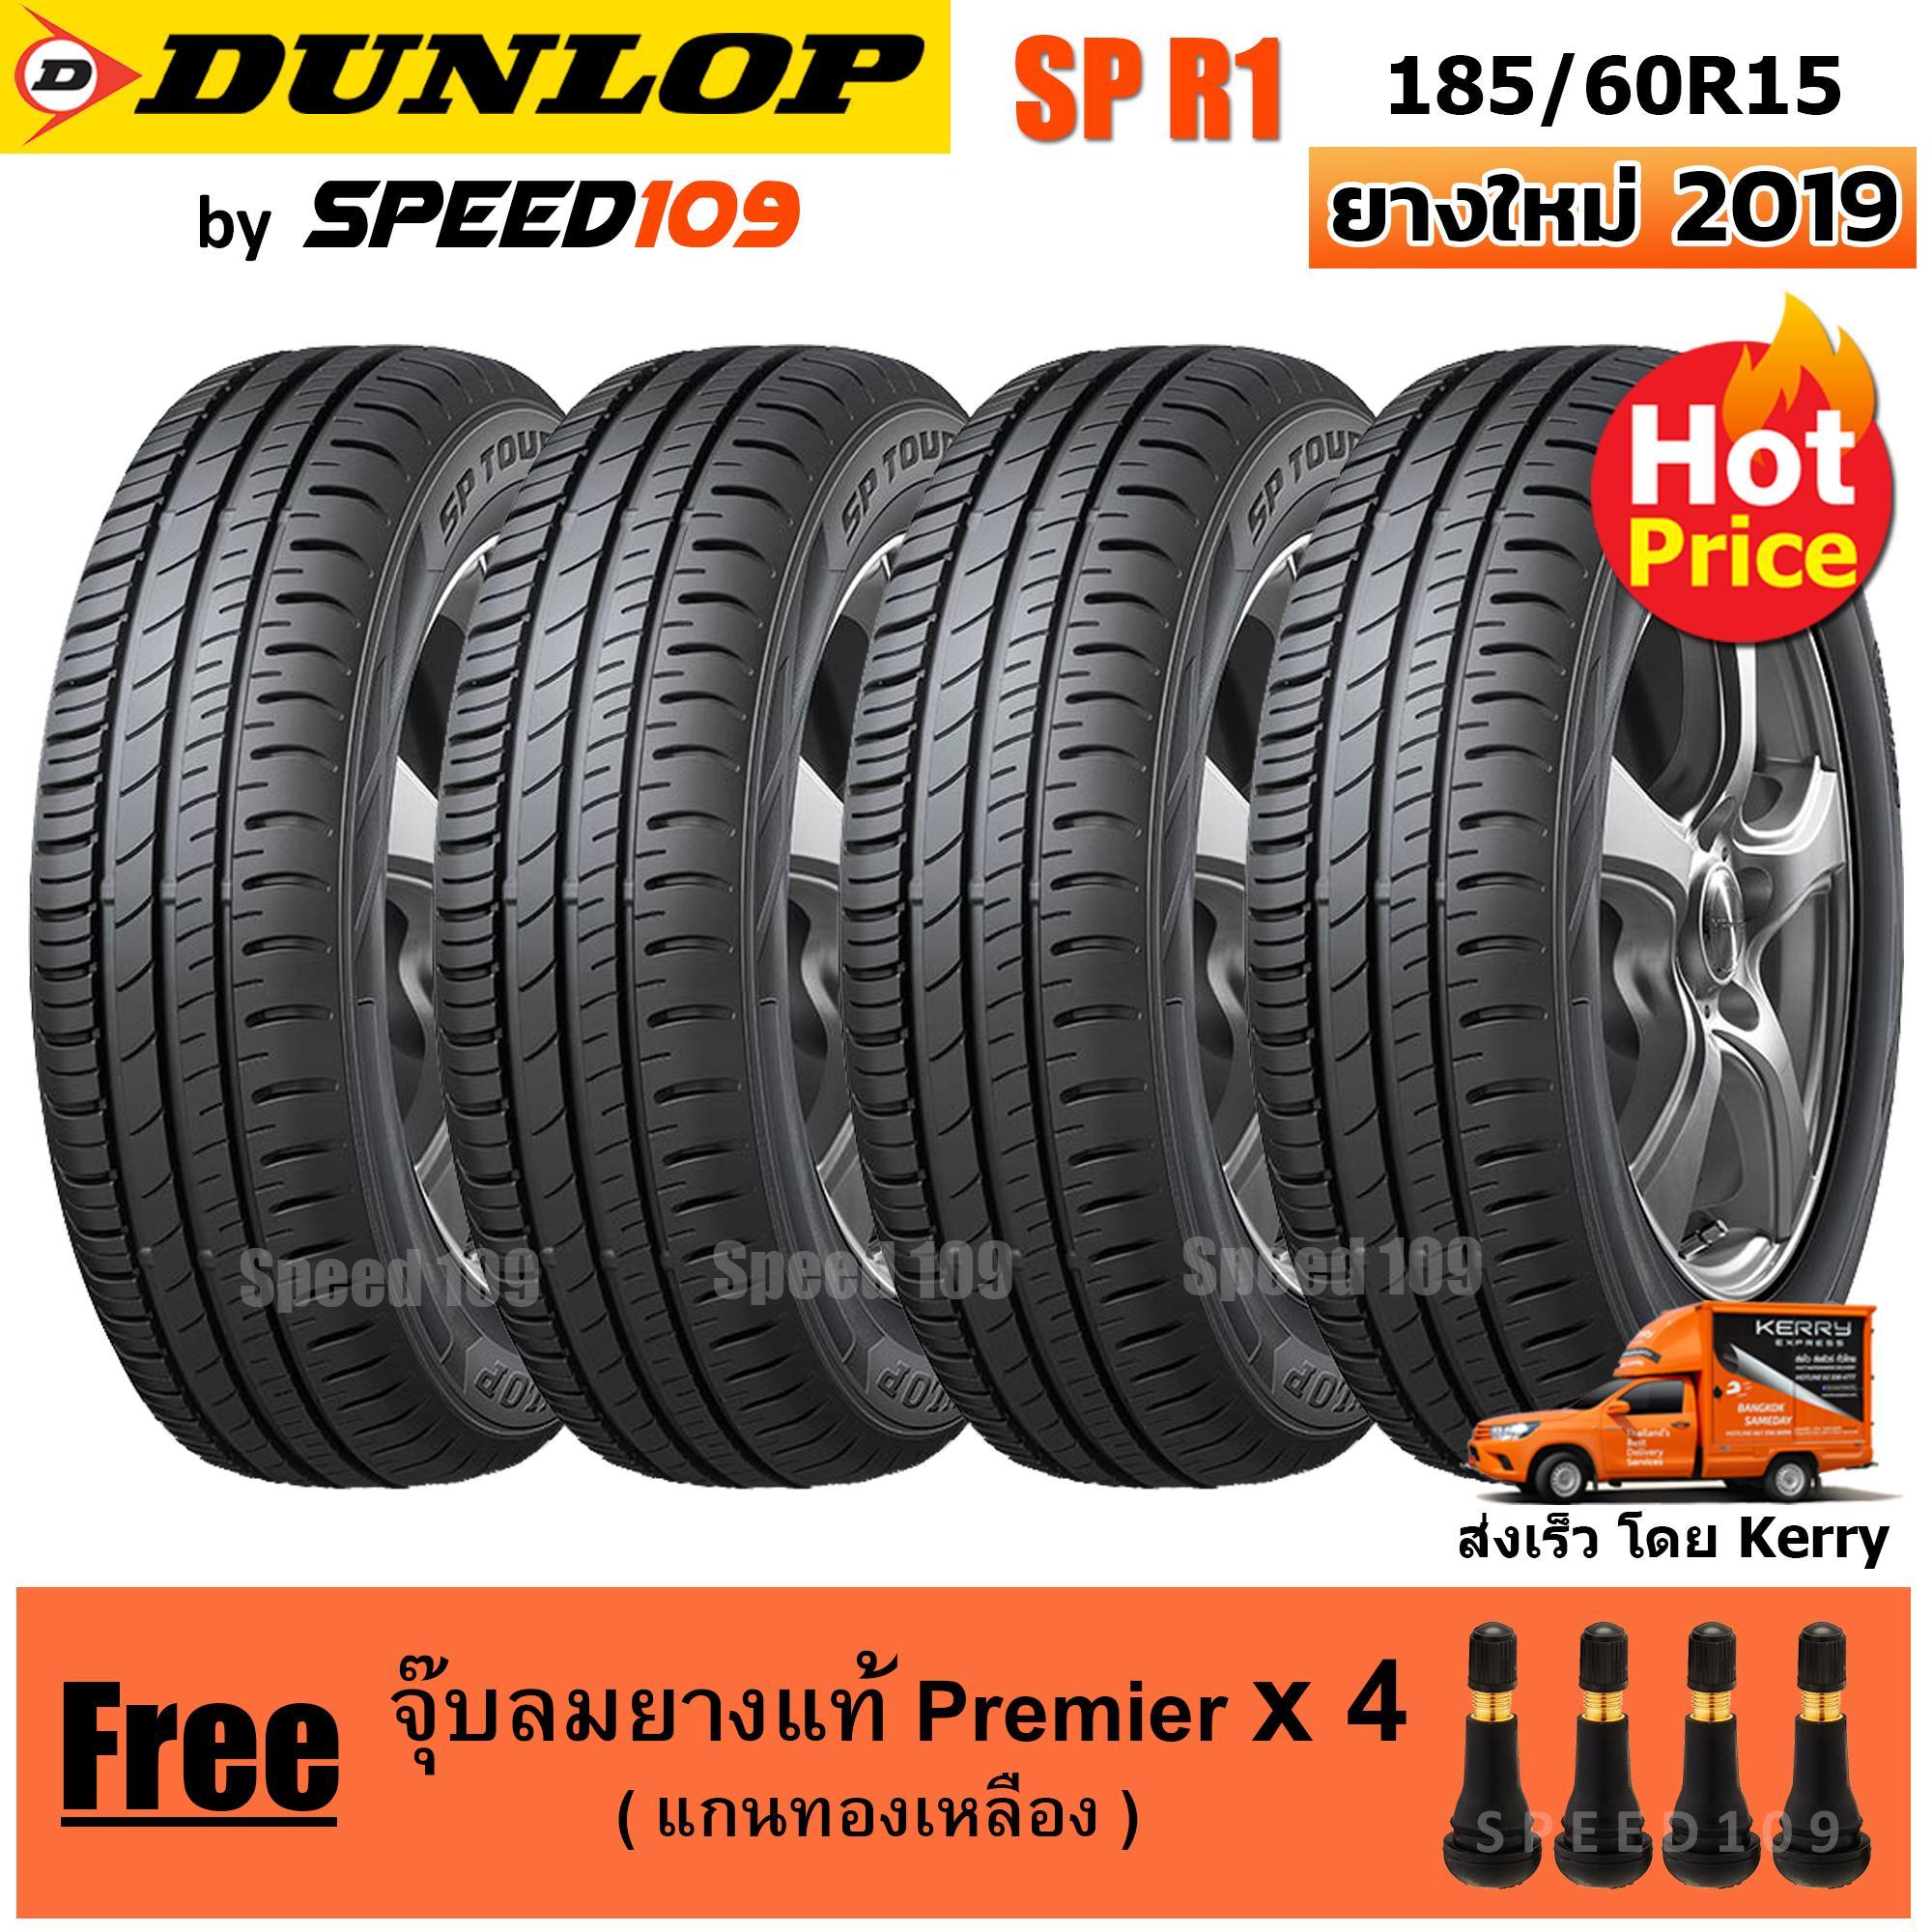 Dunlop ยางรถยนต์ ขอบ 15 ขนาด 185/60r15